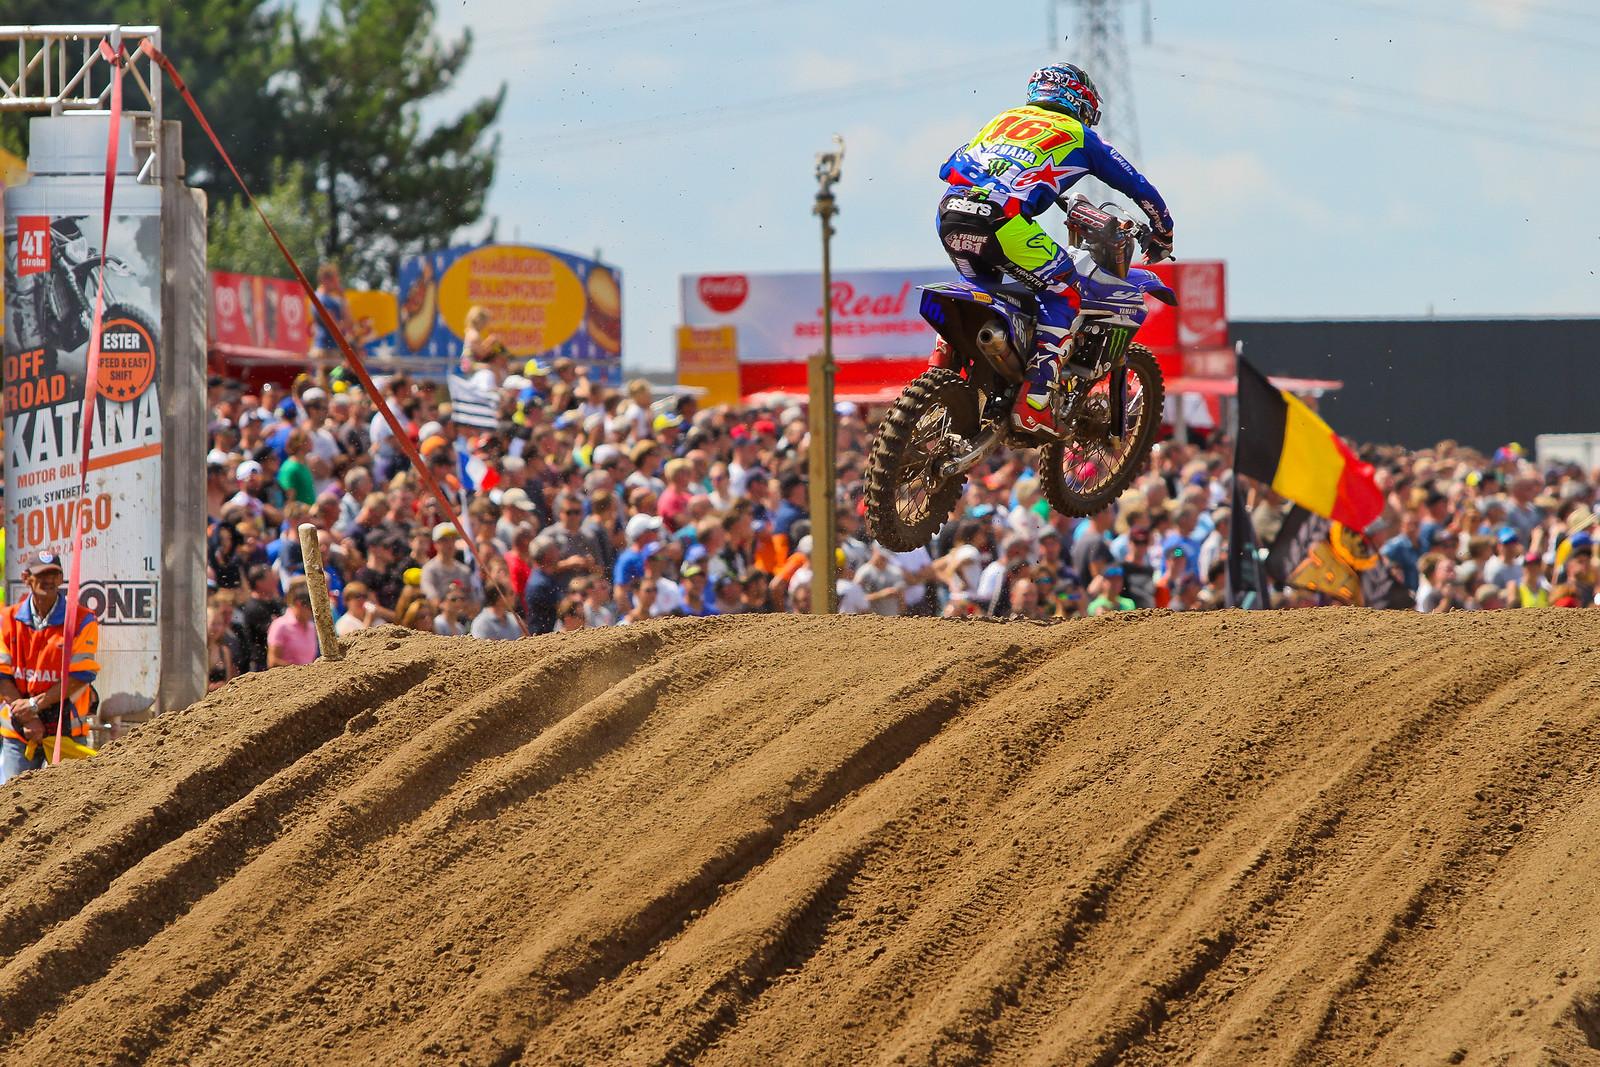 Romain Febvre - ayearinmx - Motocross Pictures - Vital MX